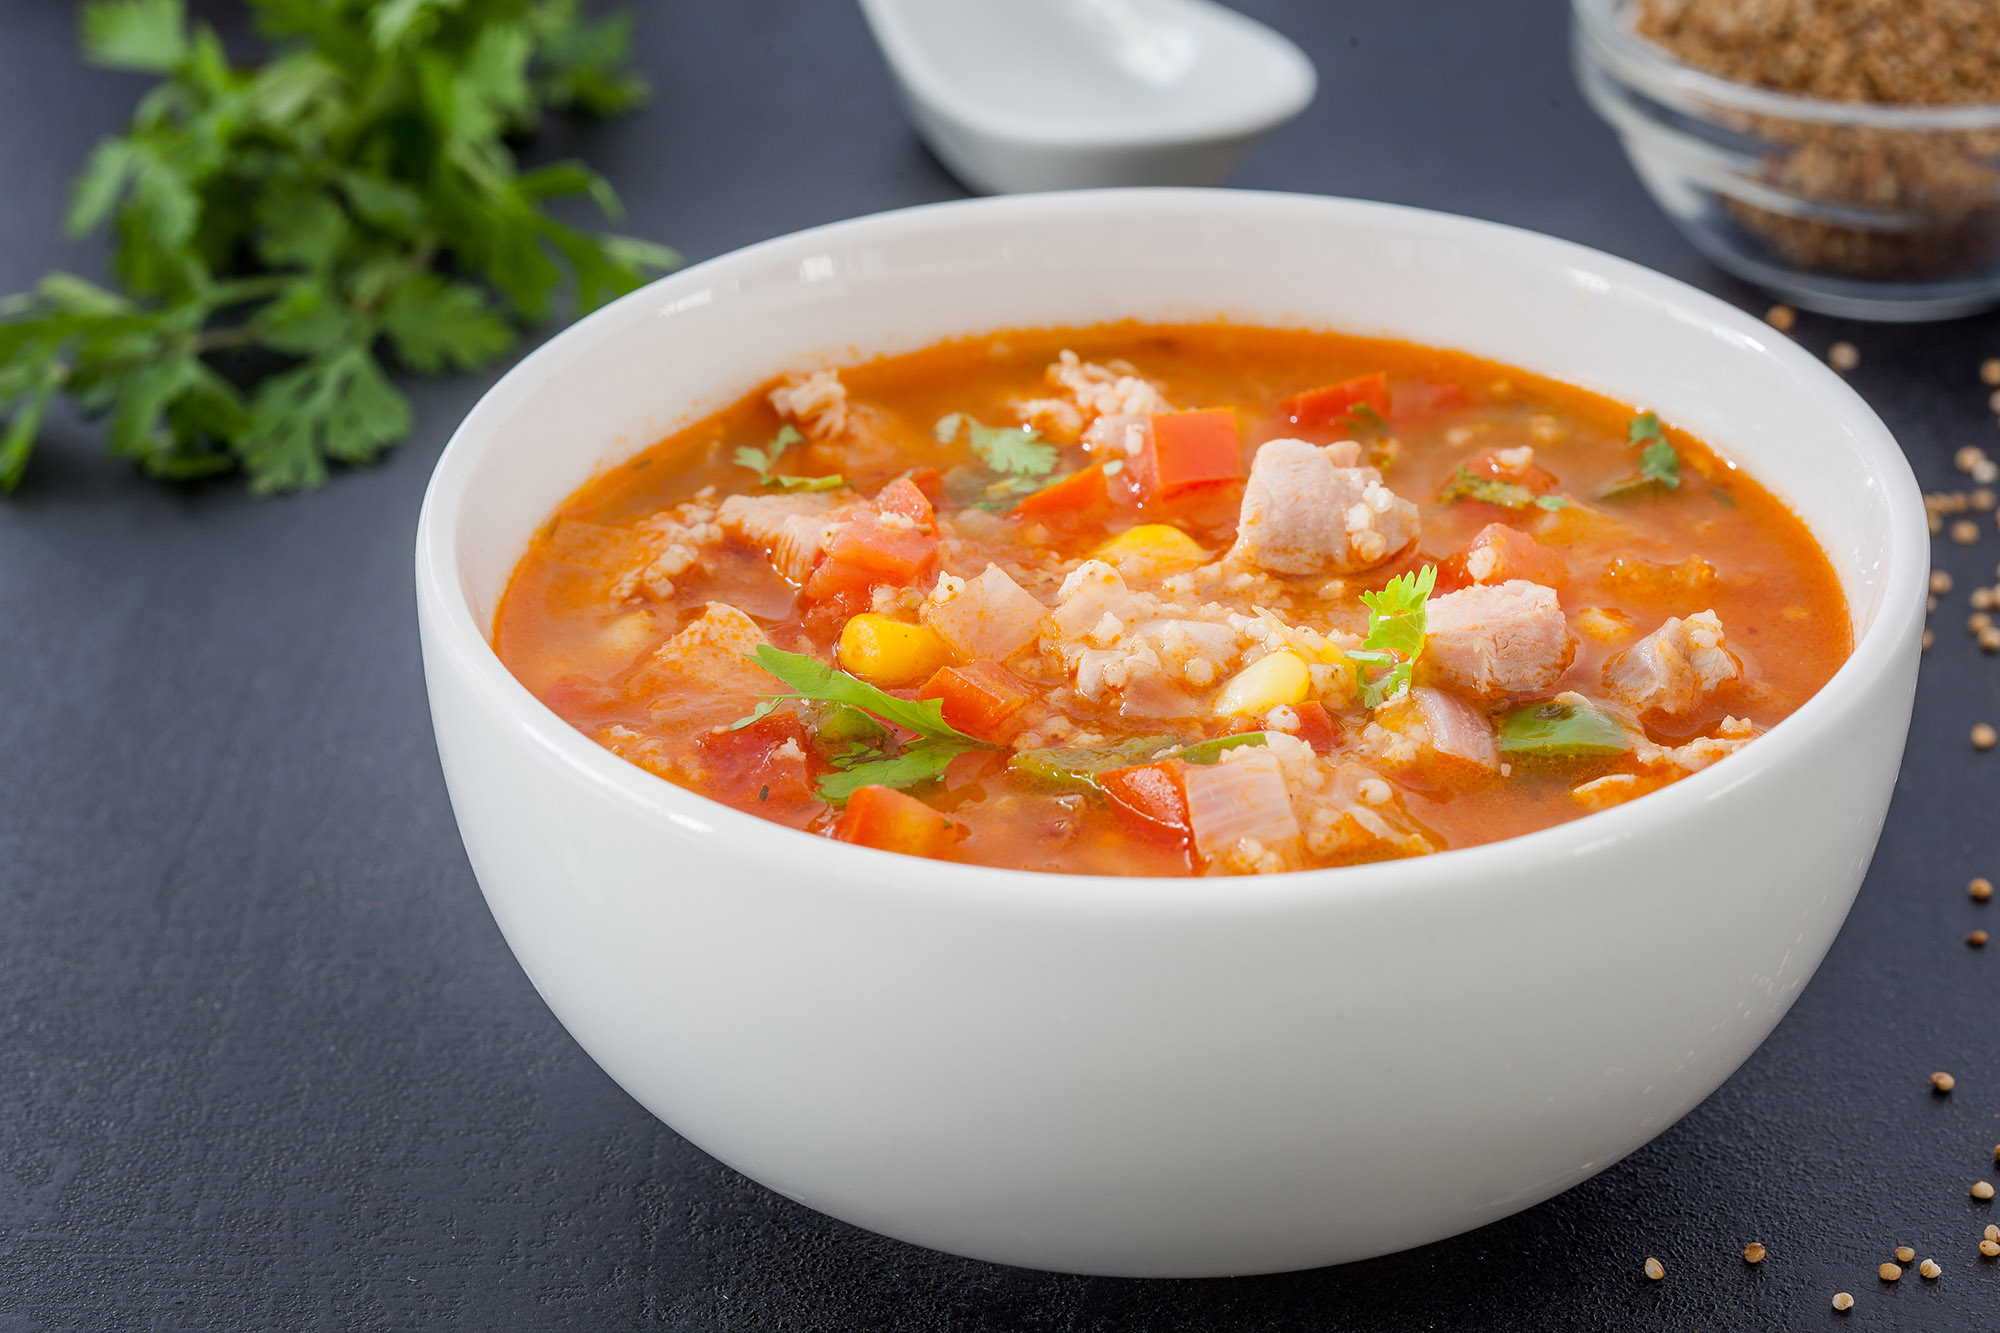 _17FM09039_Toasted Millet Chicken Soup (Non Veg).jpg